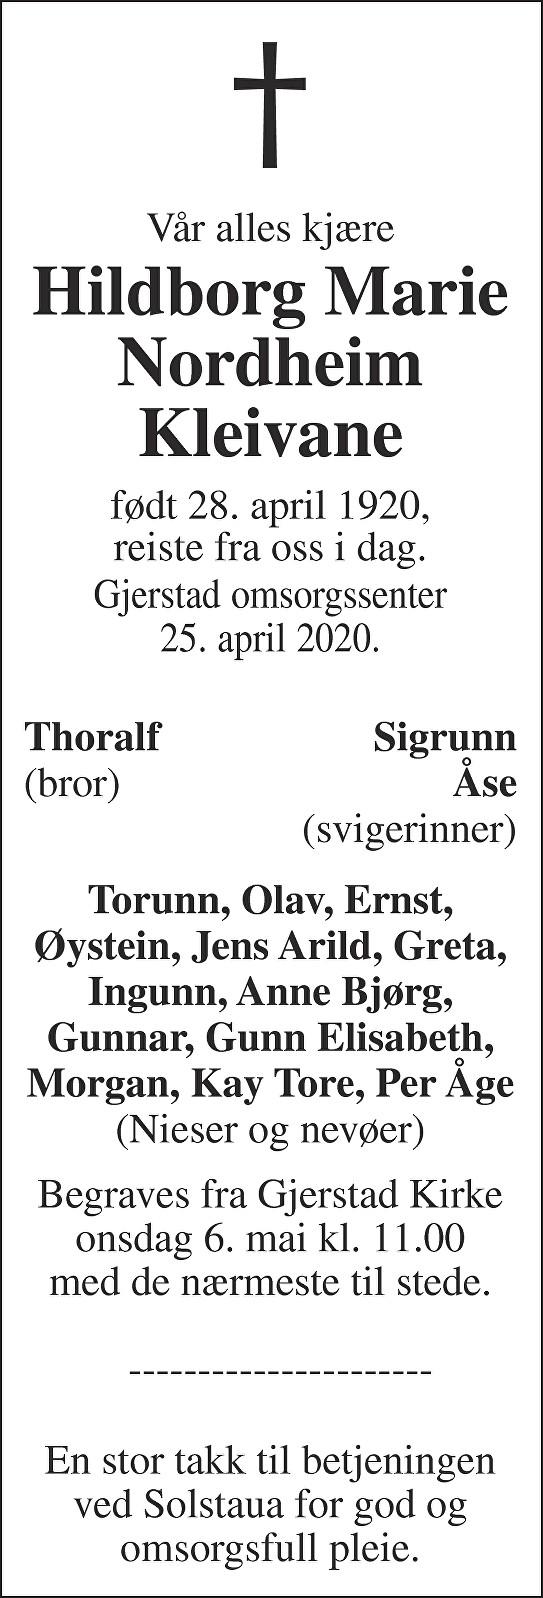 Hildborg Marie Nordheim Kleivane Dødsannonse